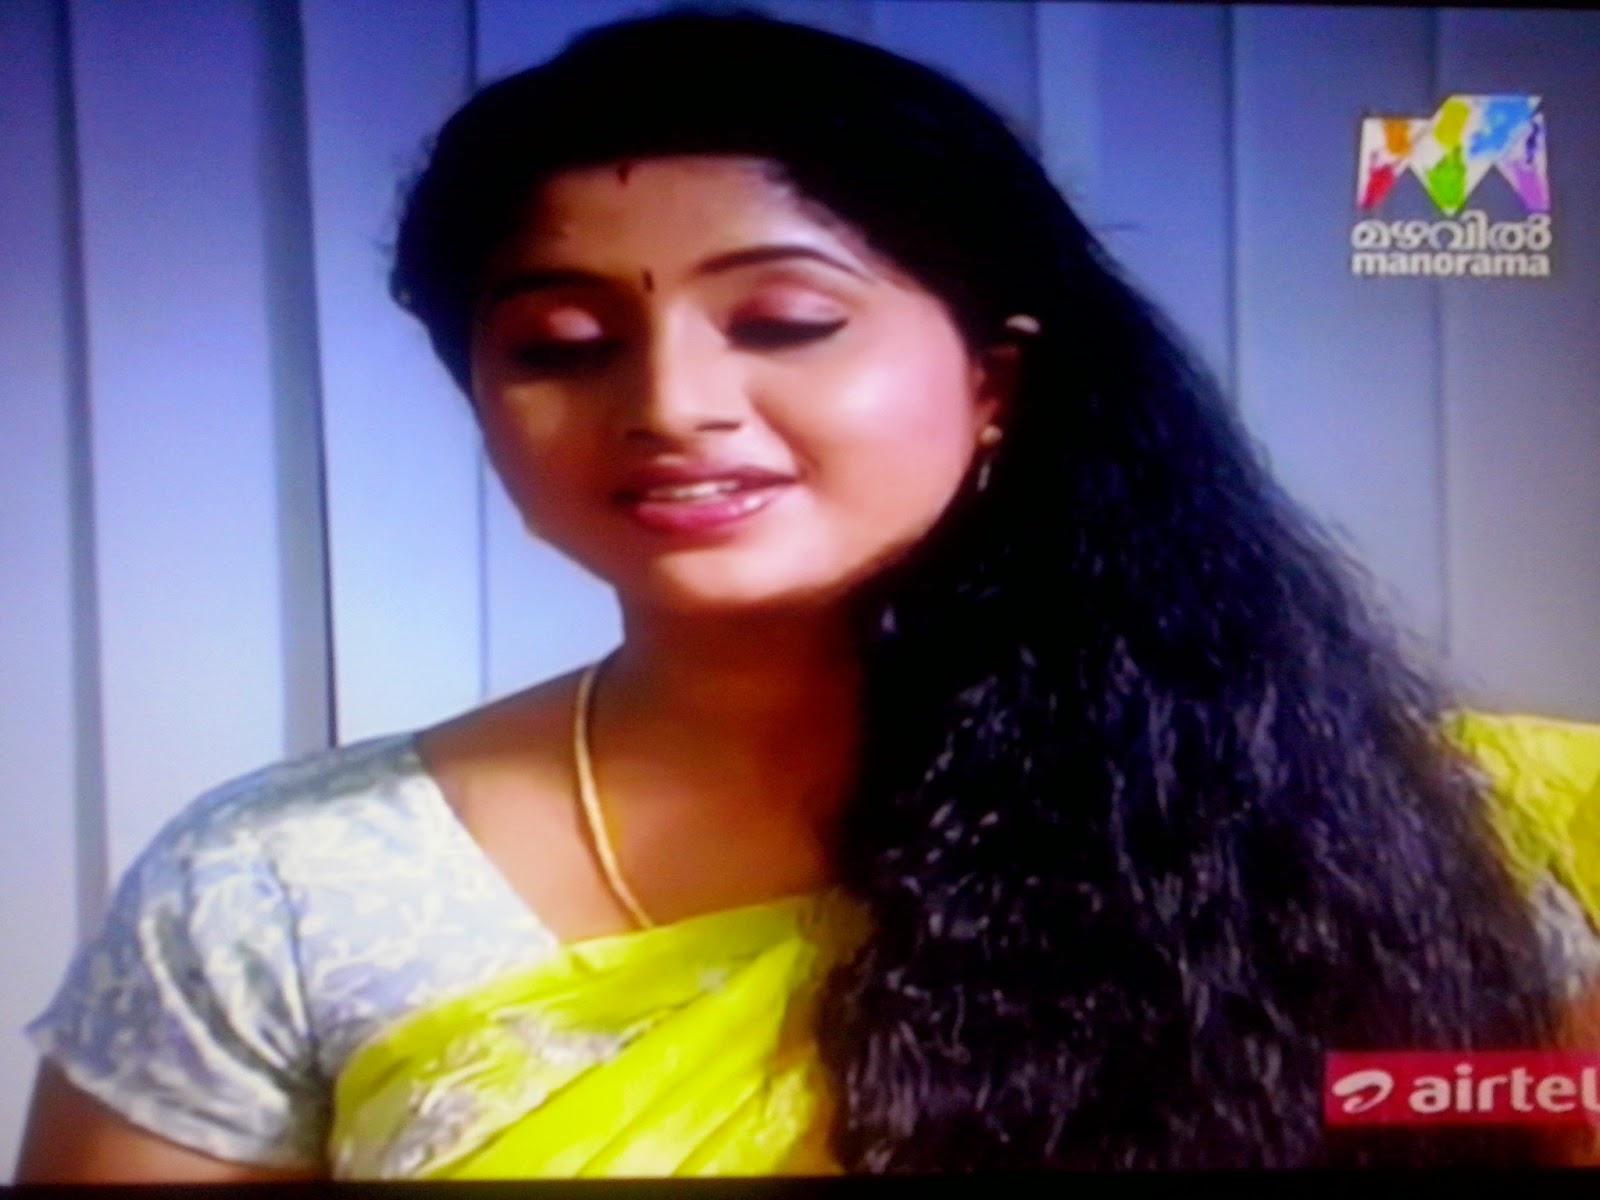 Malayalam serial nilavilakku online dating